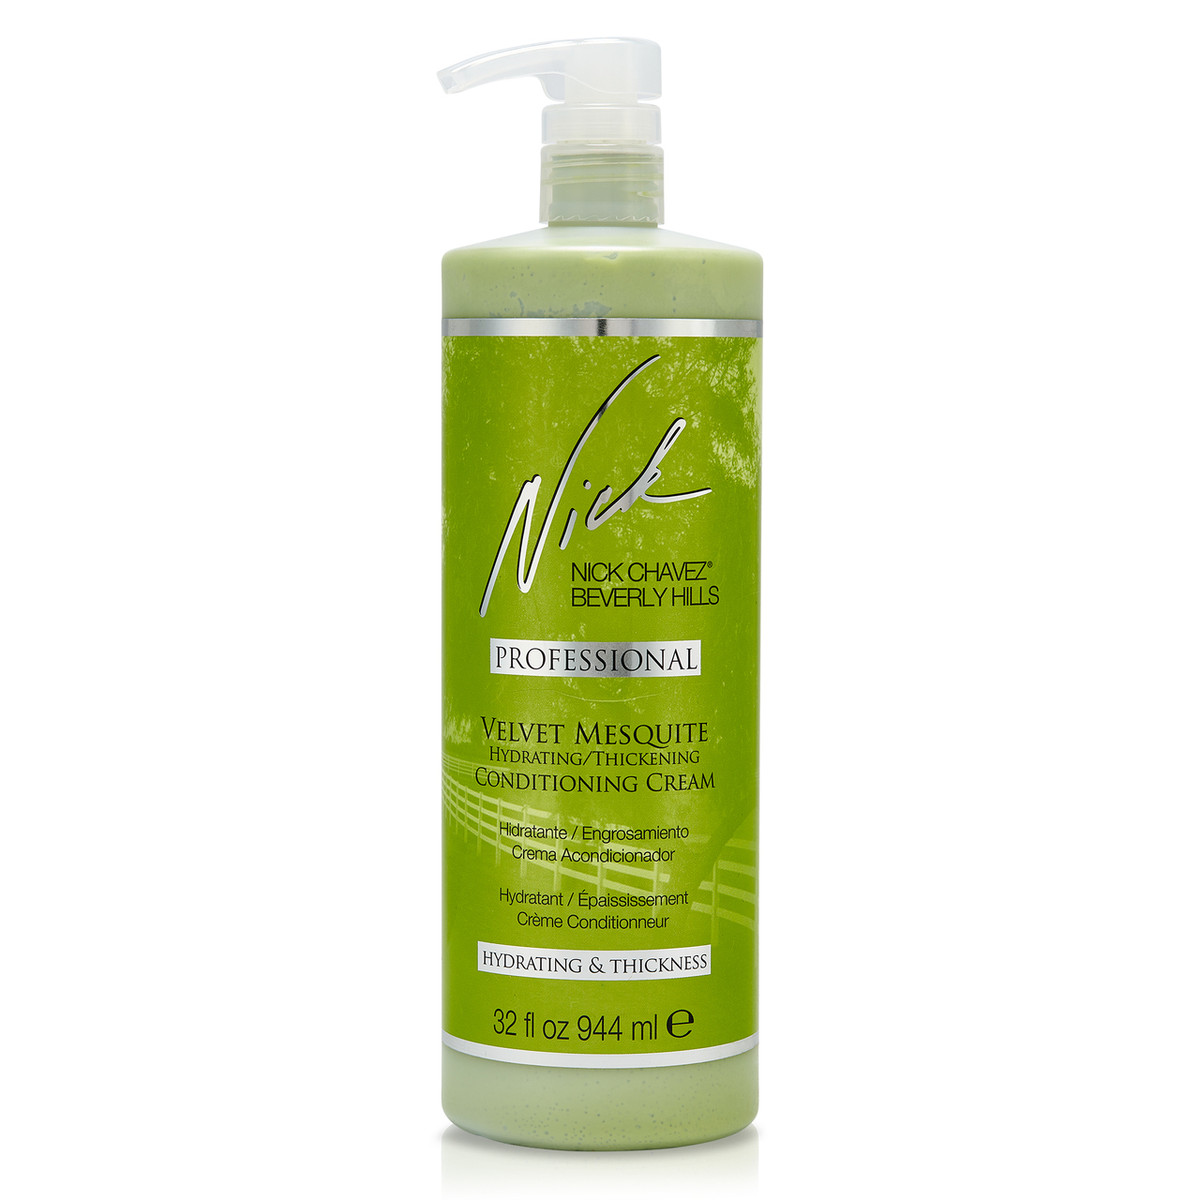 Velvet Mesquite Hydrating Thickening Conditioning Creme 32oz